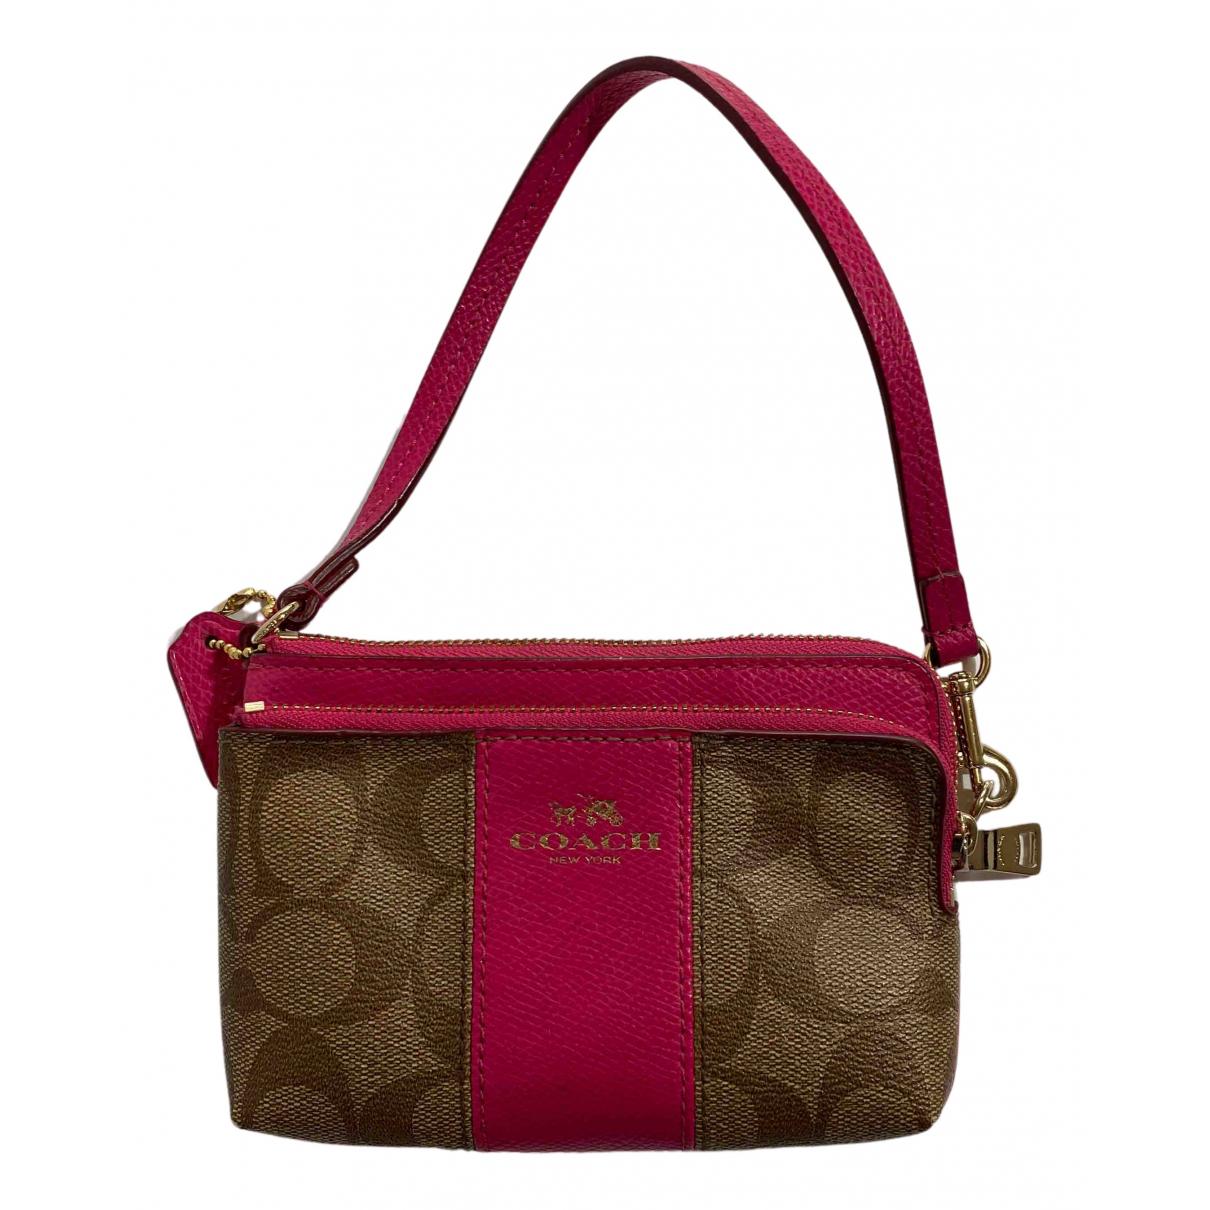 Coach N Brown Leather handbag for Women N